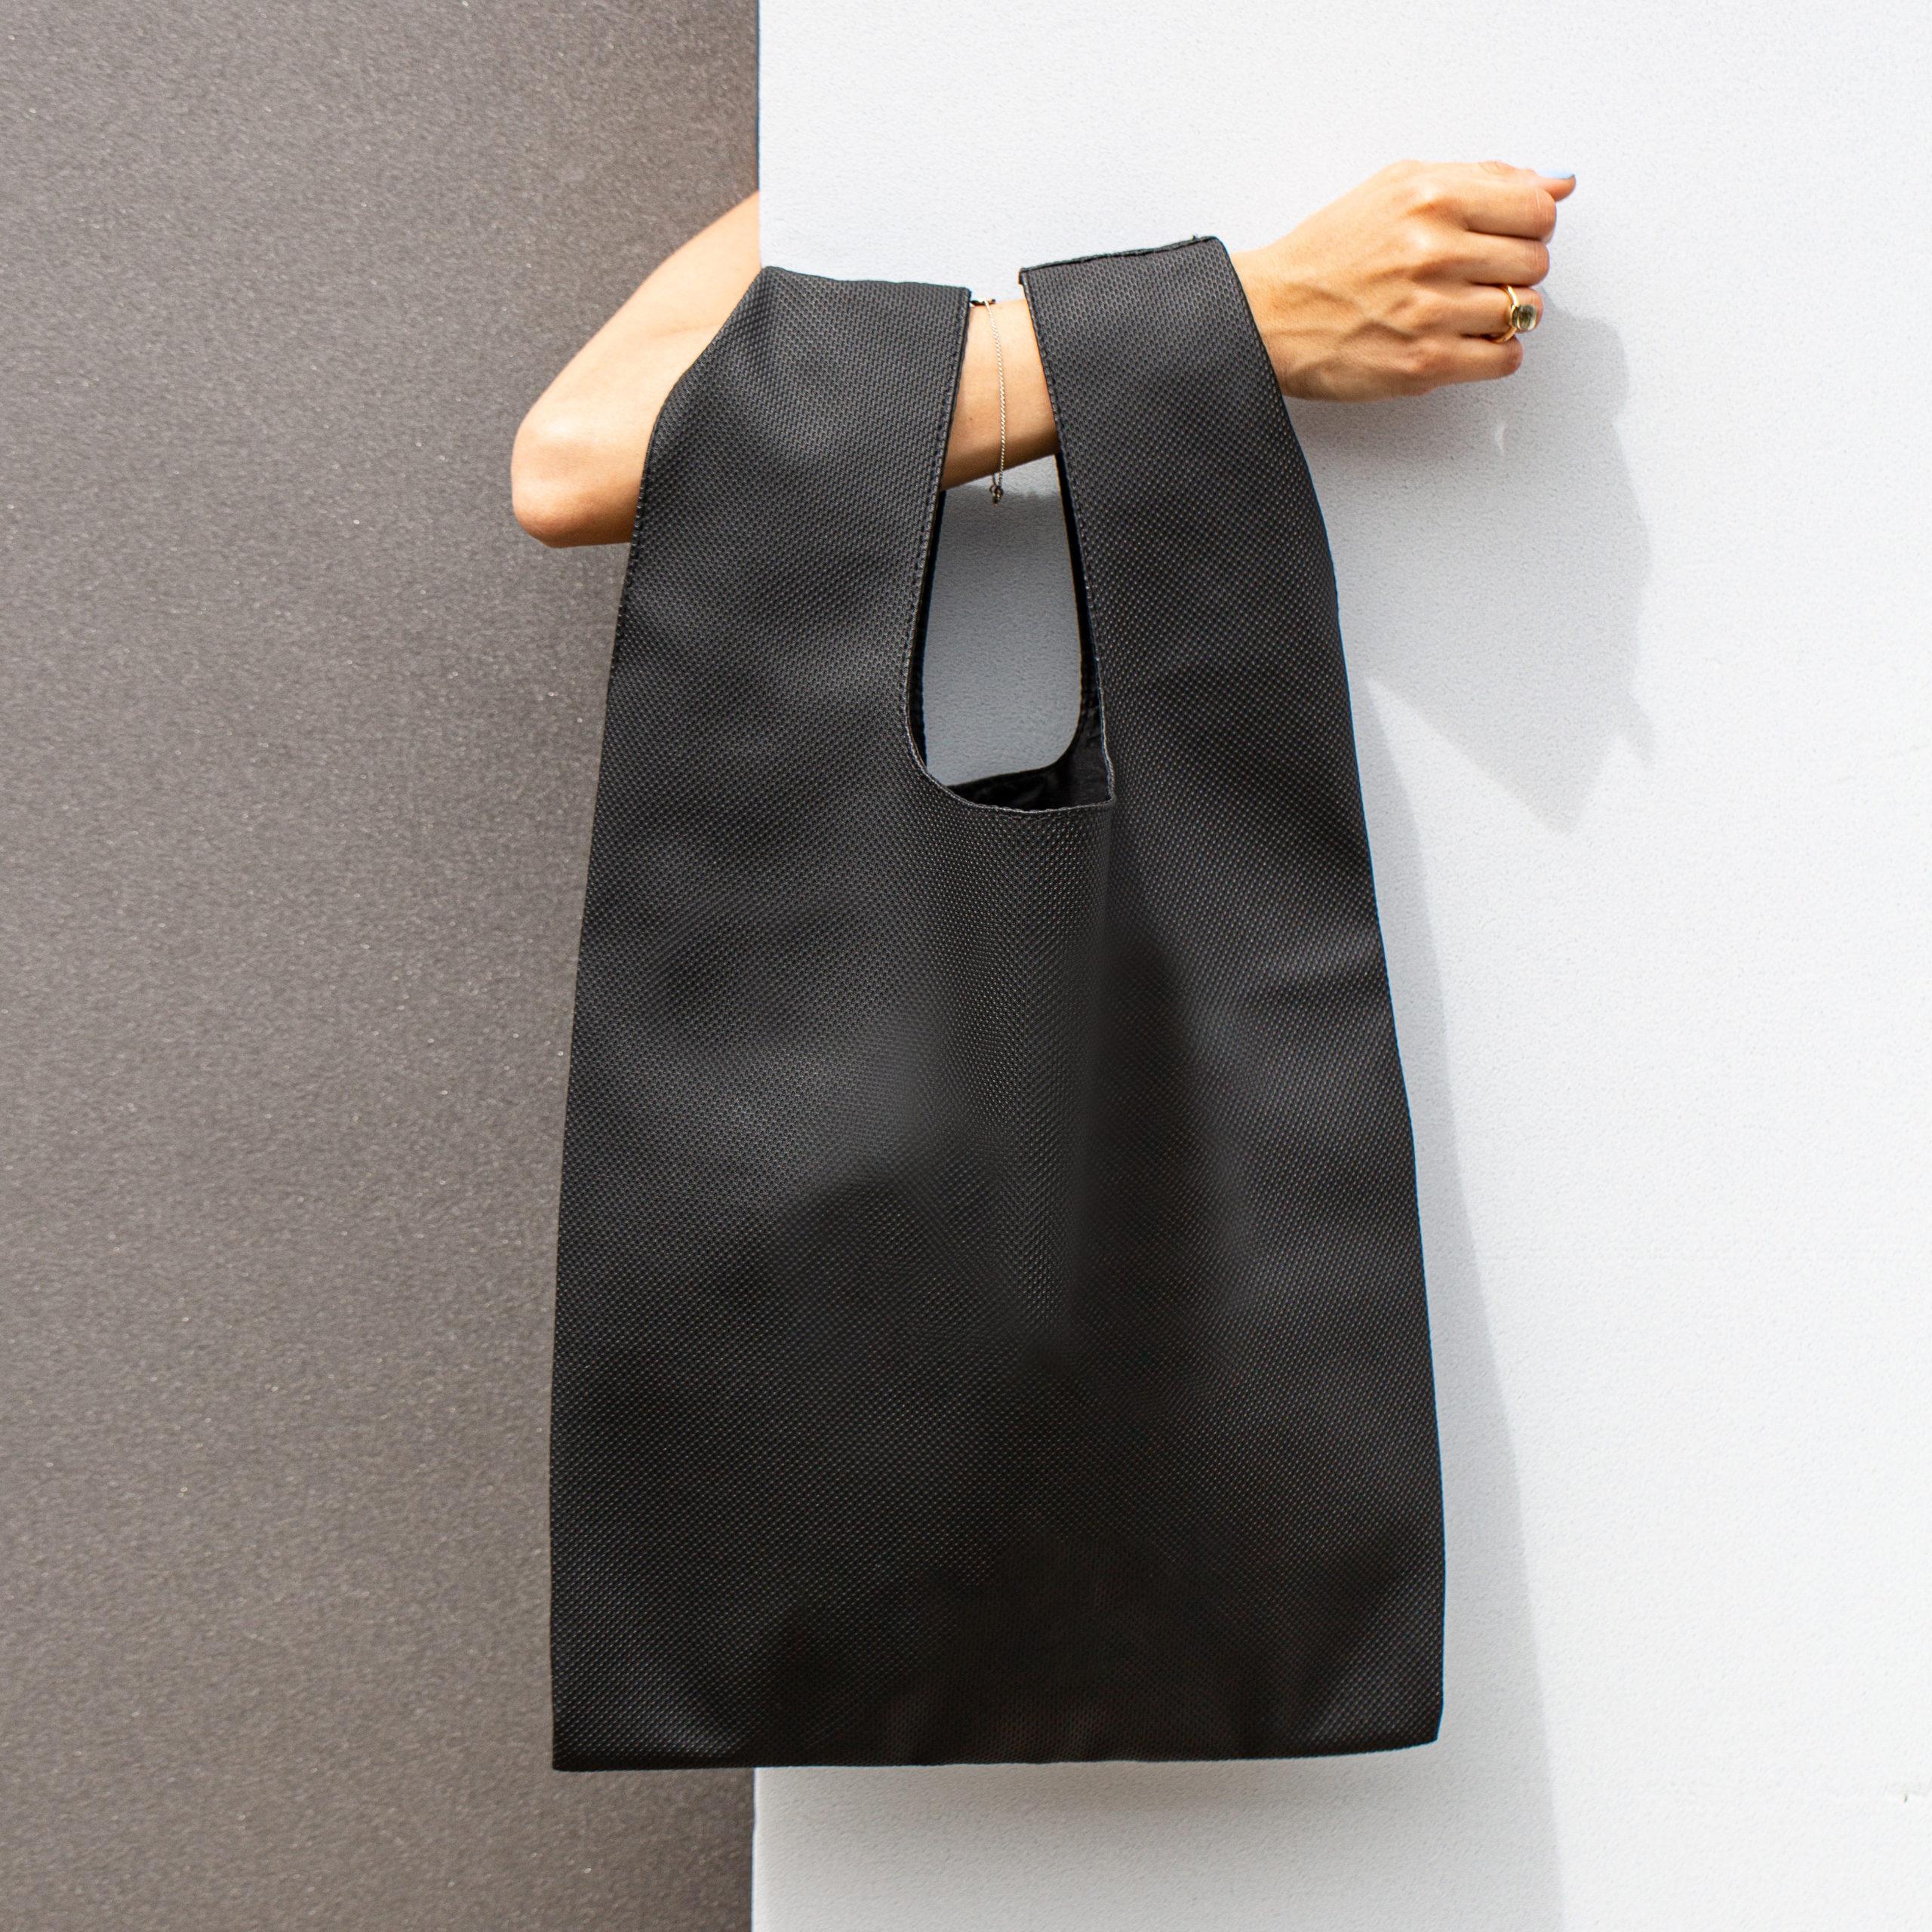 PVC shopper bag borsa